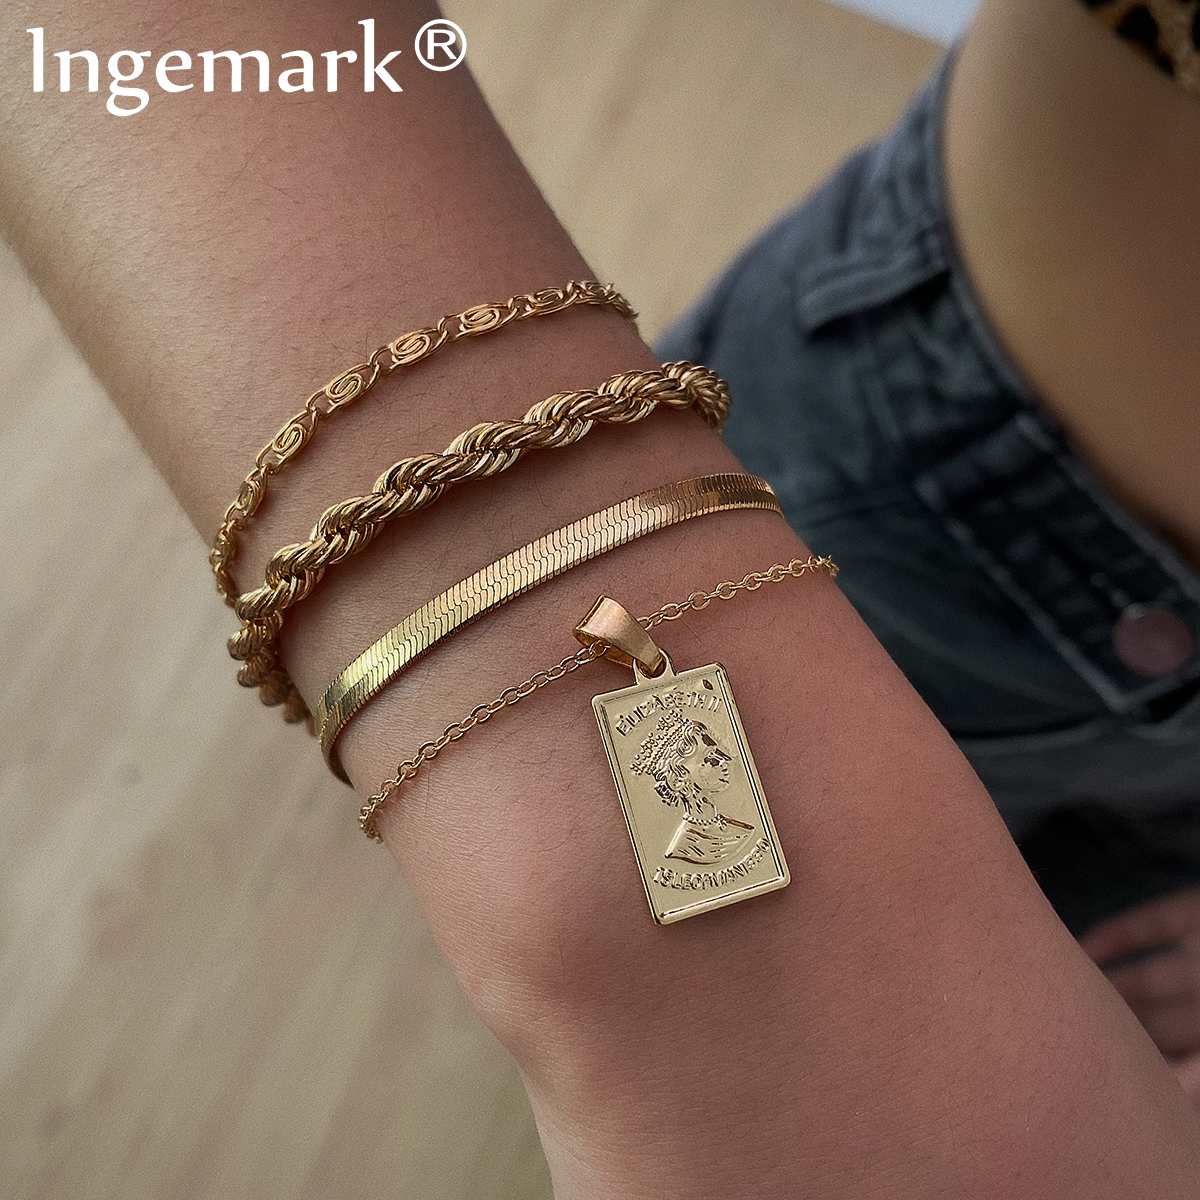 Ingemark Retro Iron Snake Chain Bracelets Set for Men Armband Punk Charm Angel Pendant Bracelet Bangle Best Women Jewelry Gifts